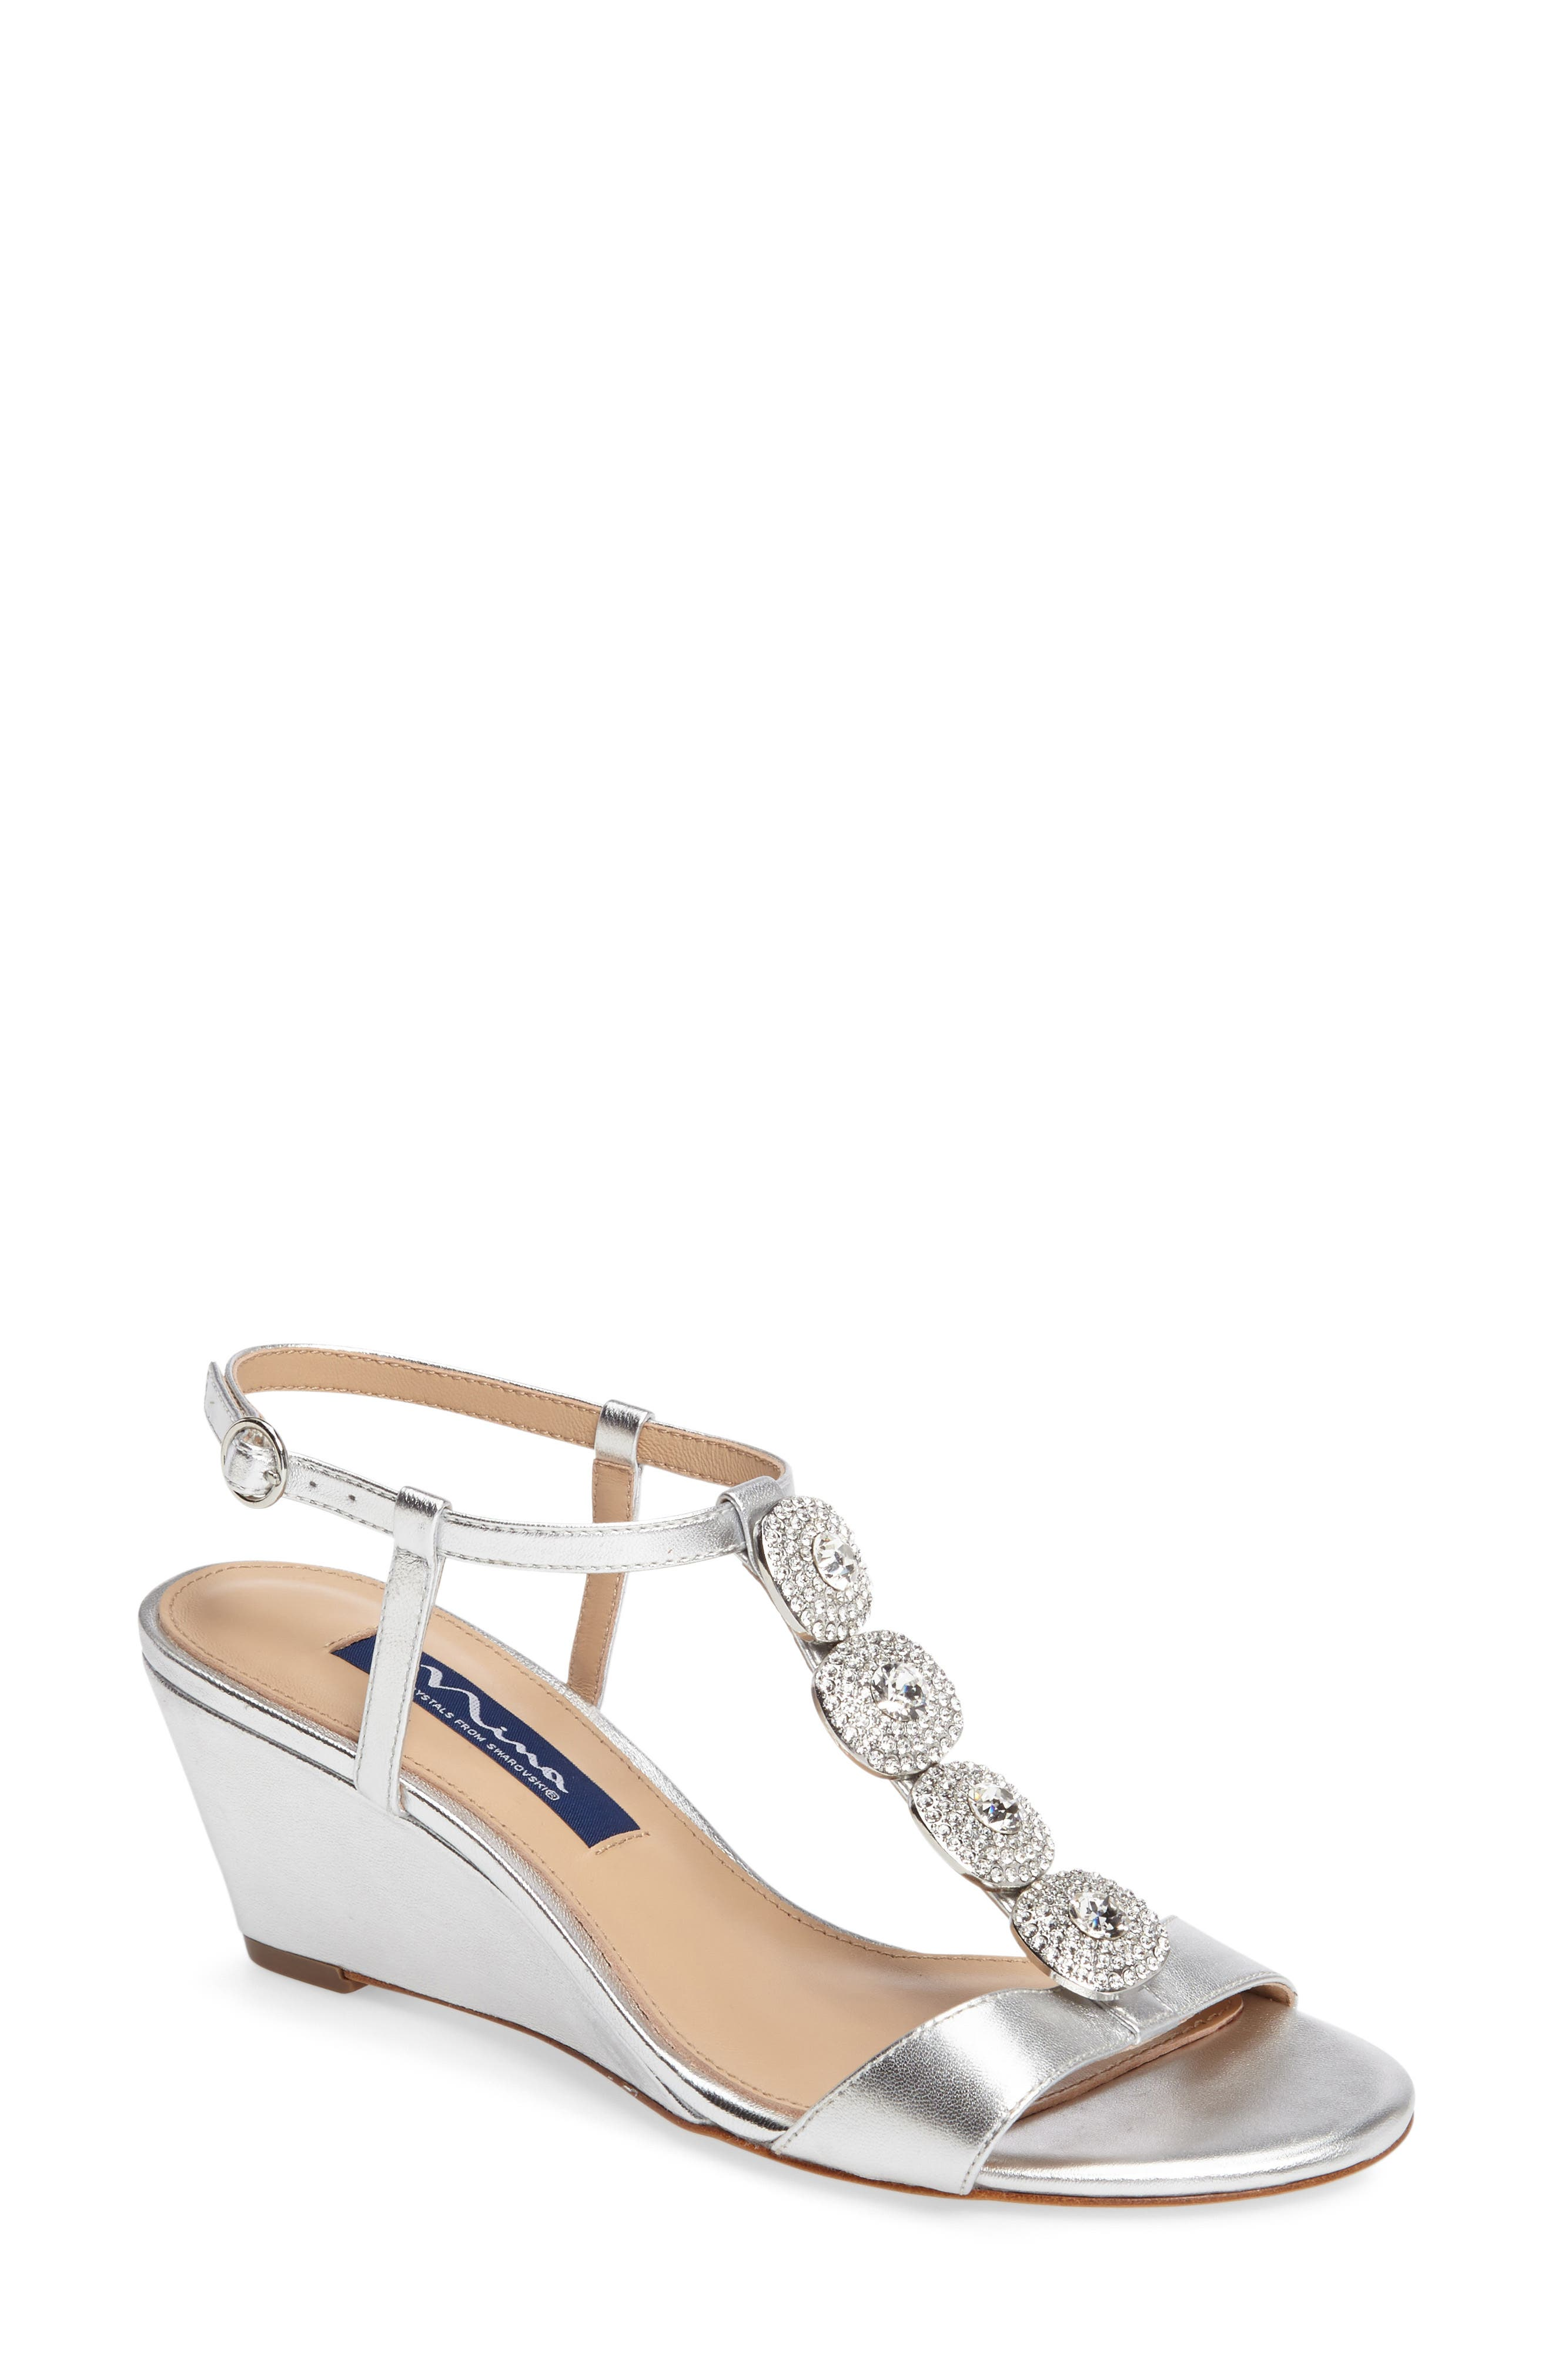 Natania Swarovski Wedge Sandal,                         Main,                         color, 043